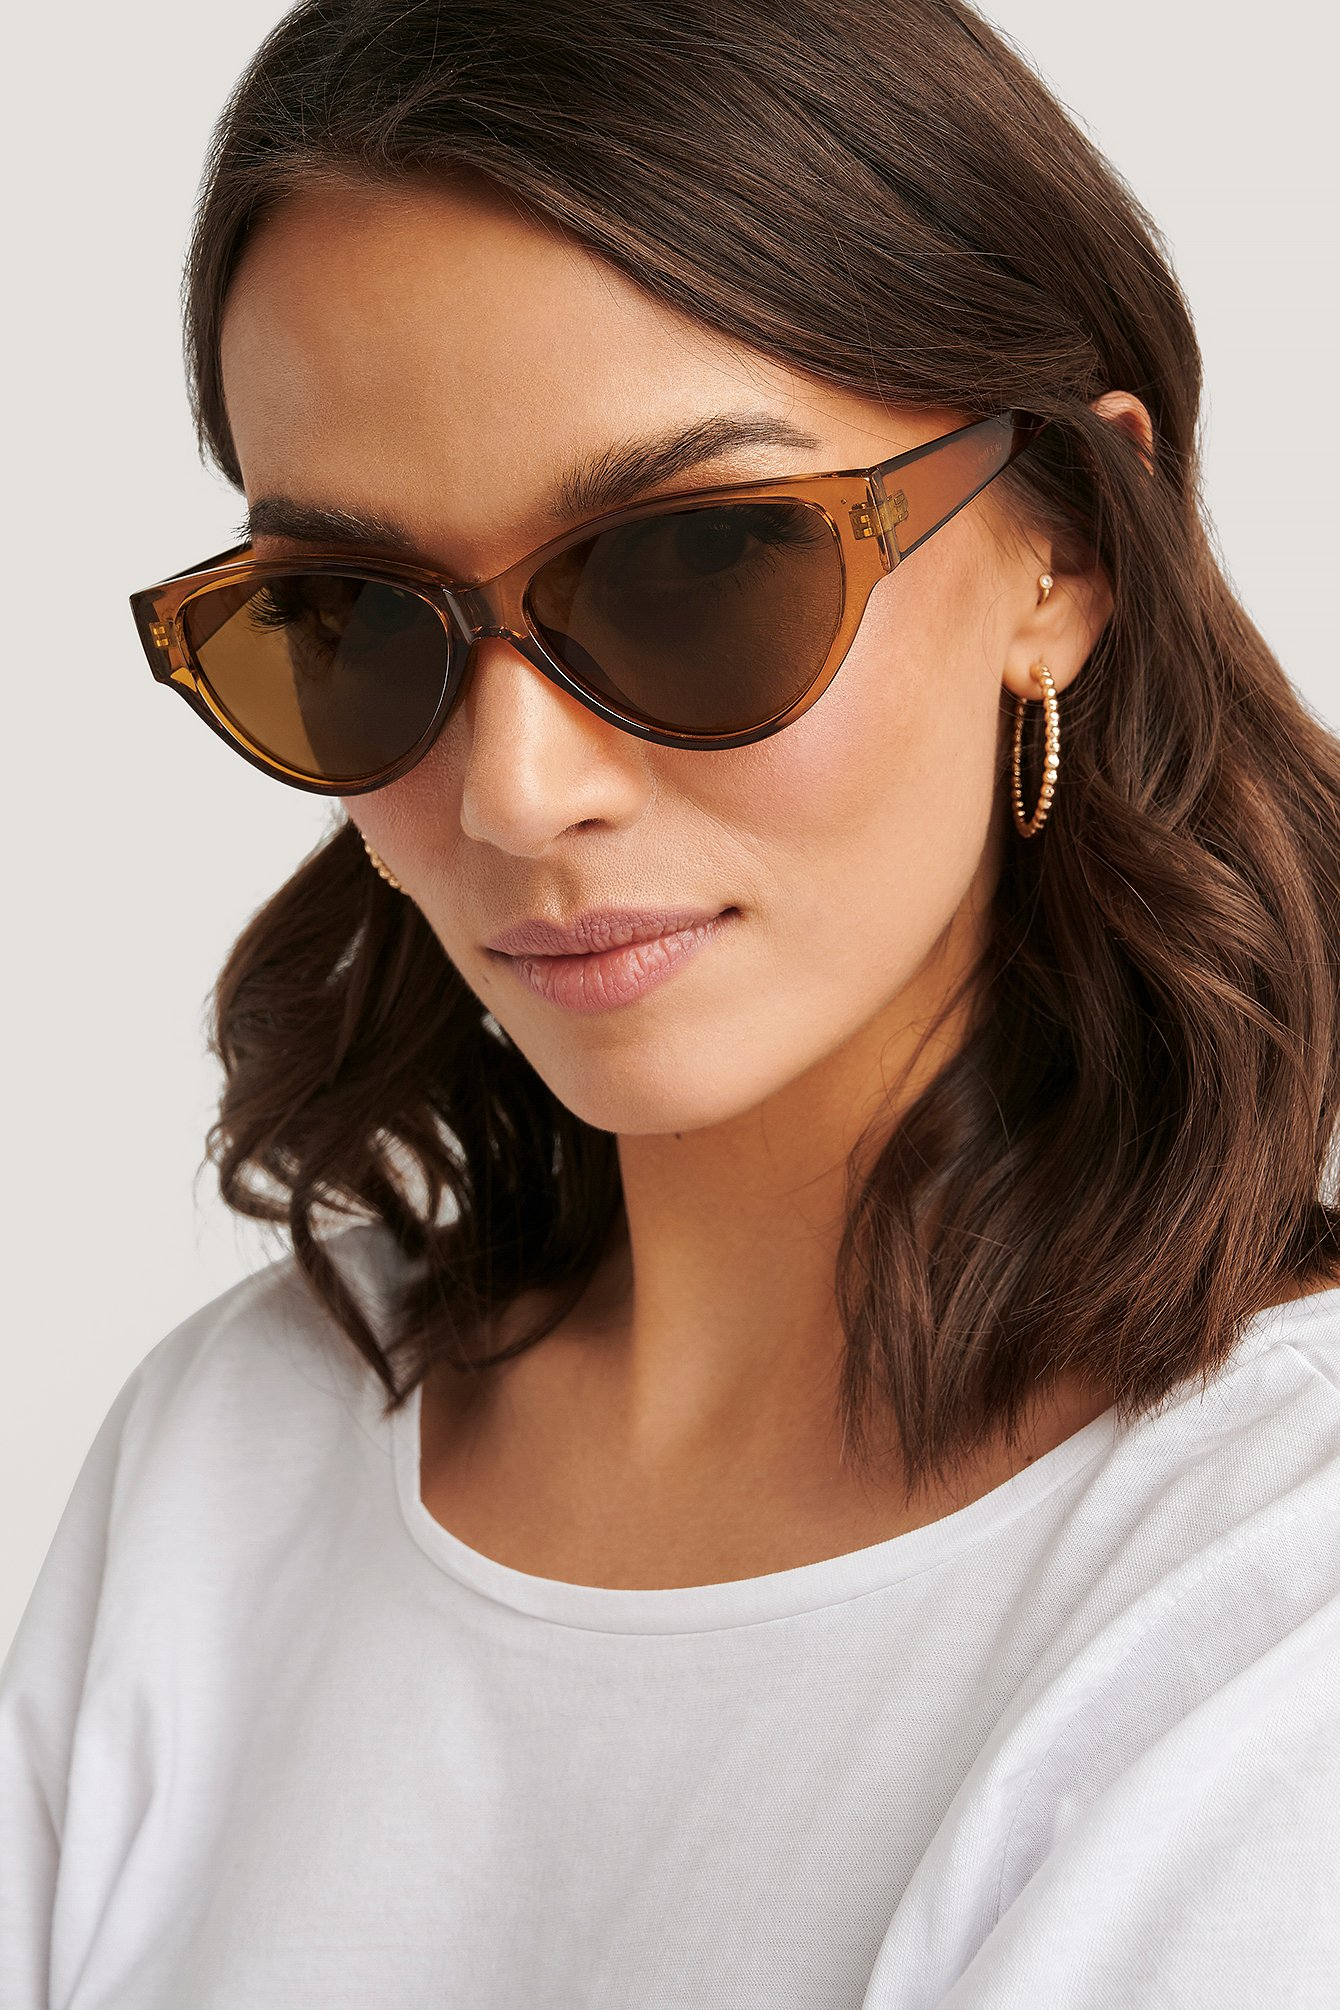 na-kd accessories -  Drop Shaped Cateye Sunglasses - Brown